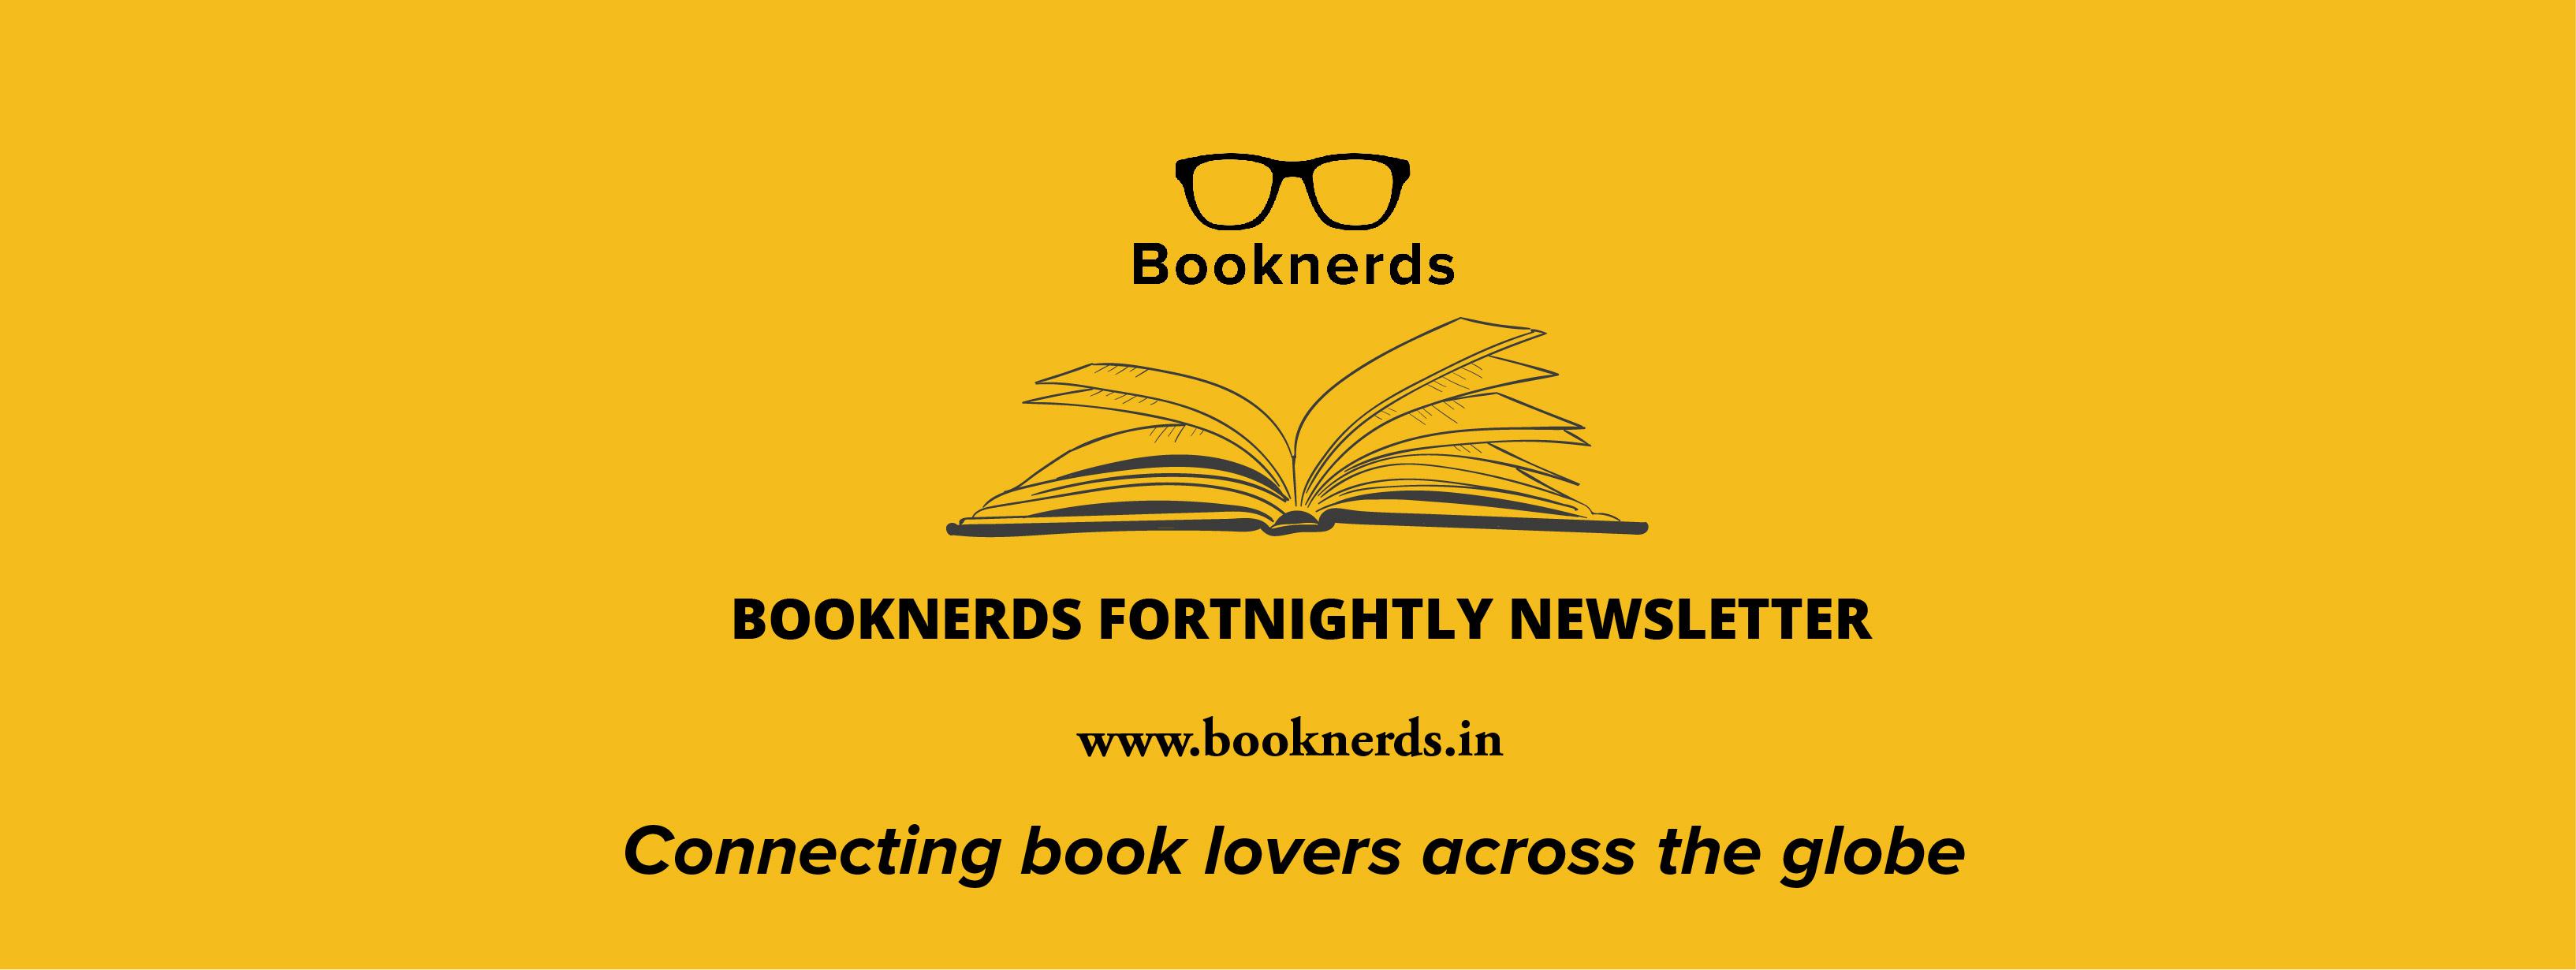 Booknerds Fortnightly Newsletter |August 1|2020